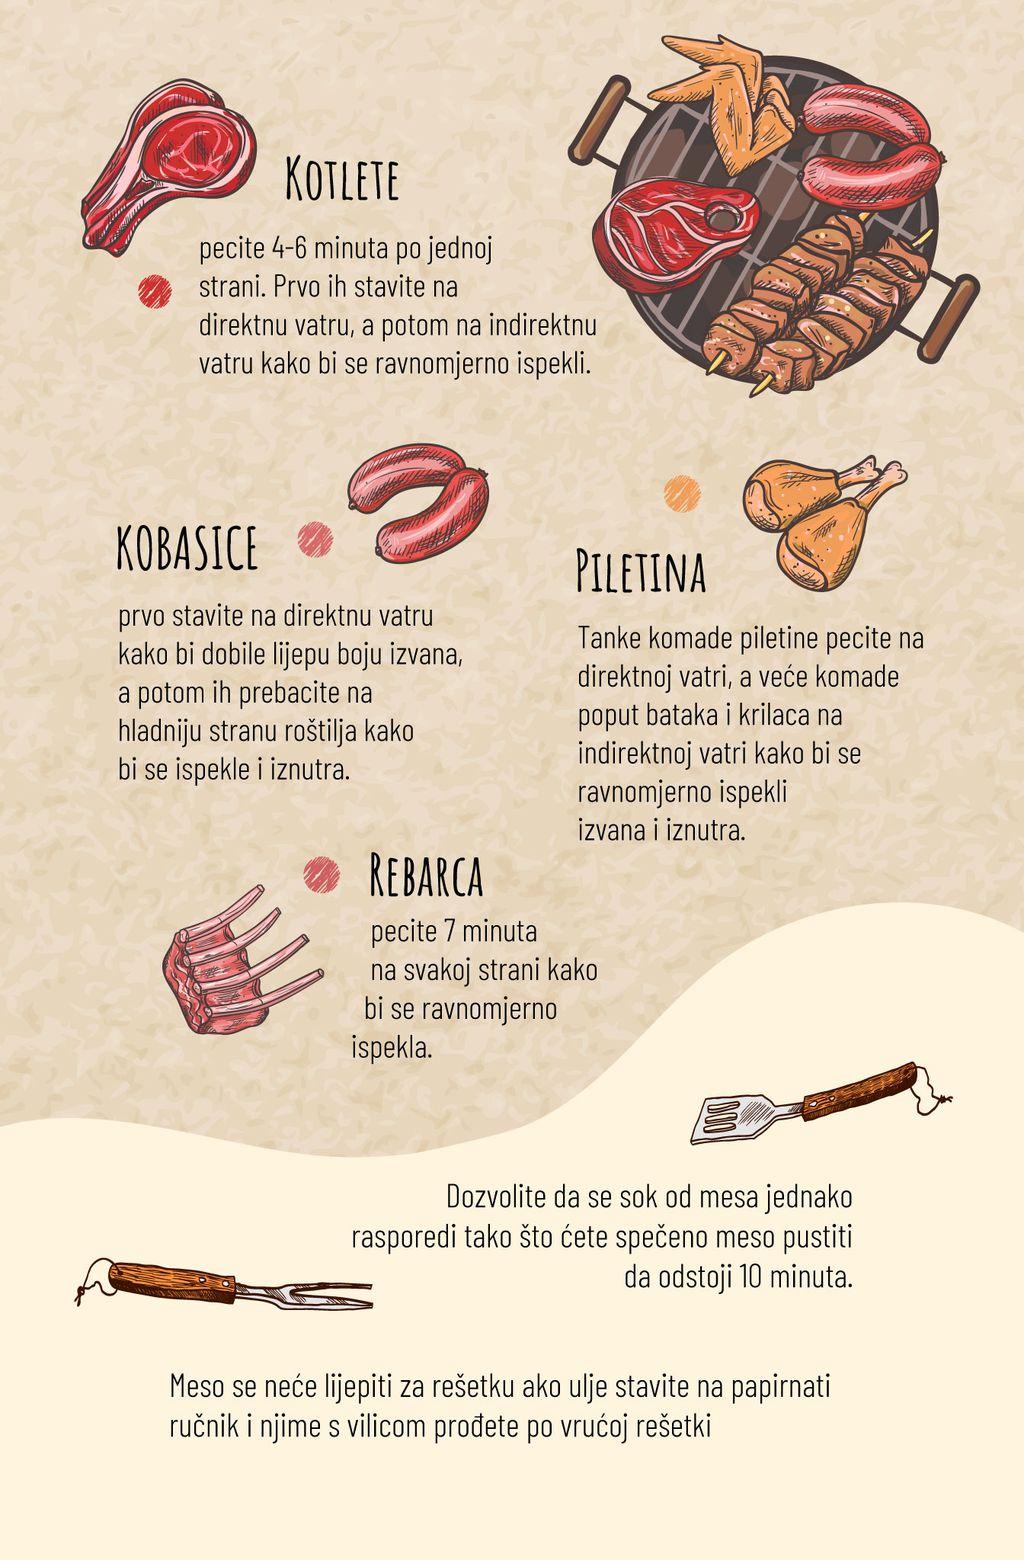 Različiti komadi mesa peku se na različite načine